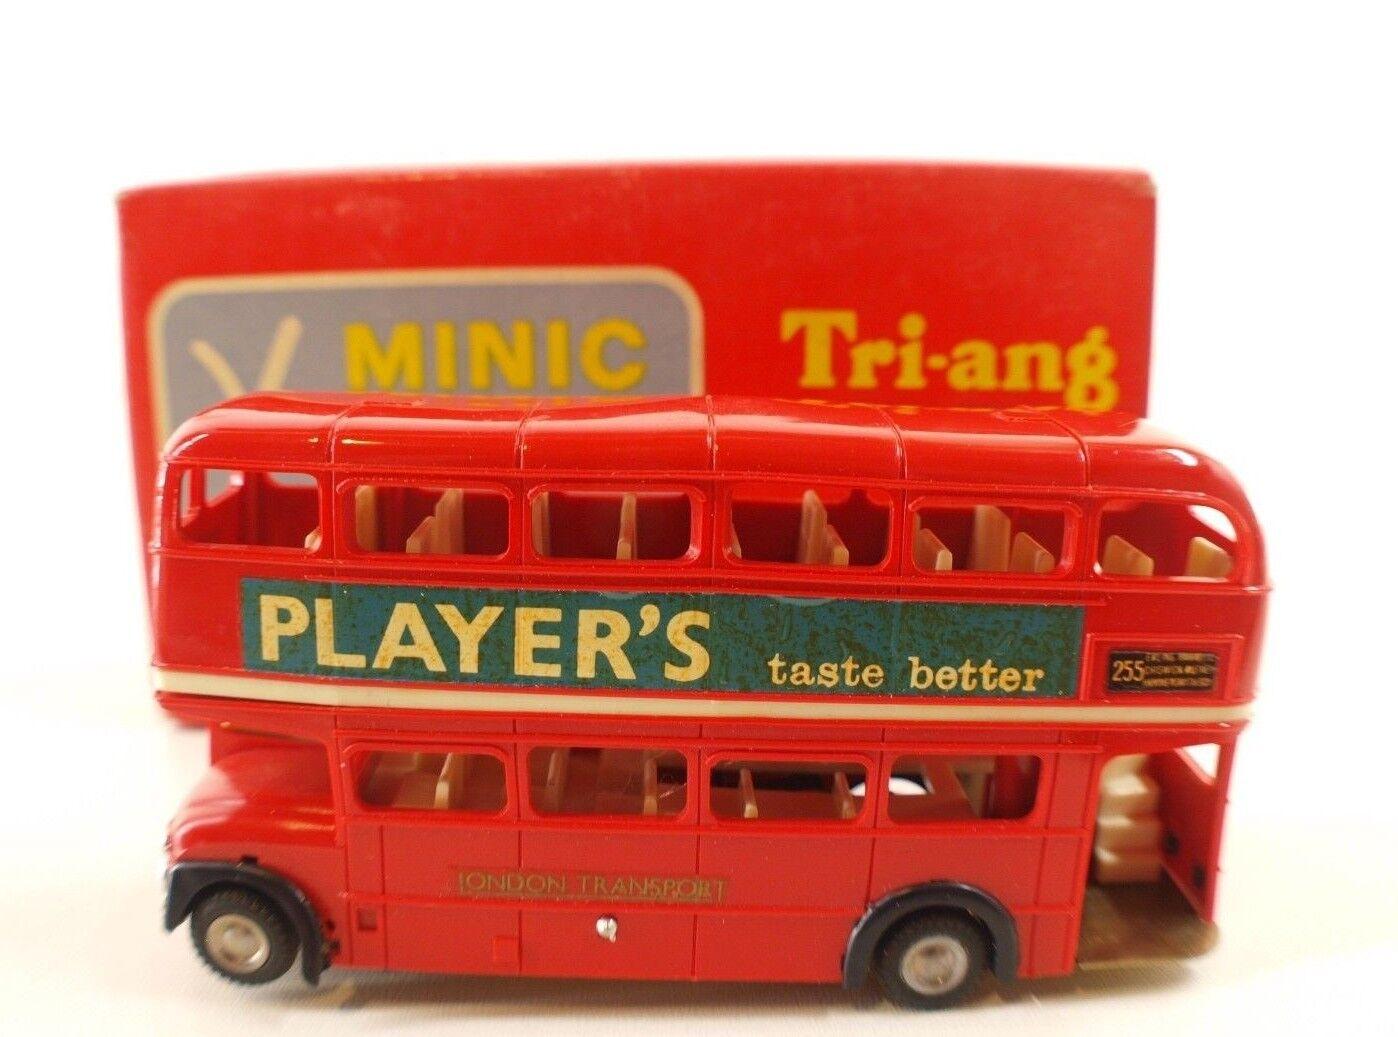 Tri-ang Minic 1M1545 bus player's autorute Autobahn slot car rare boite 11 cm